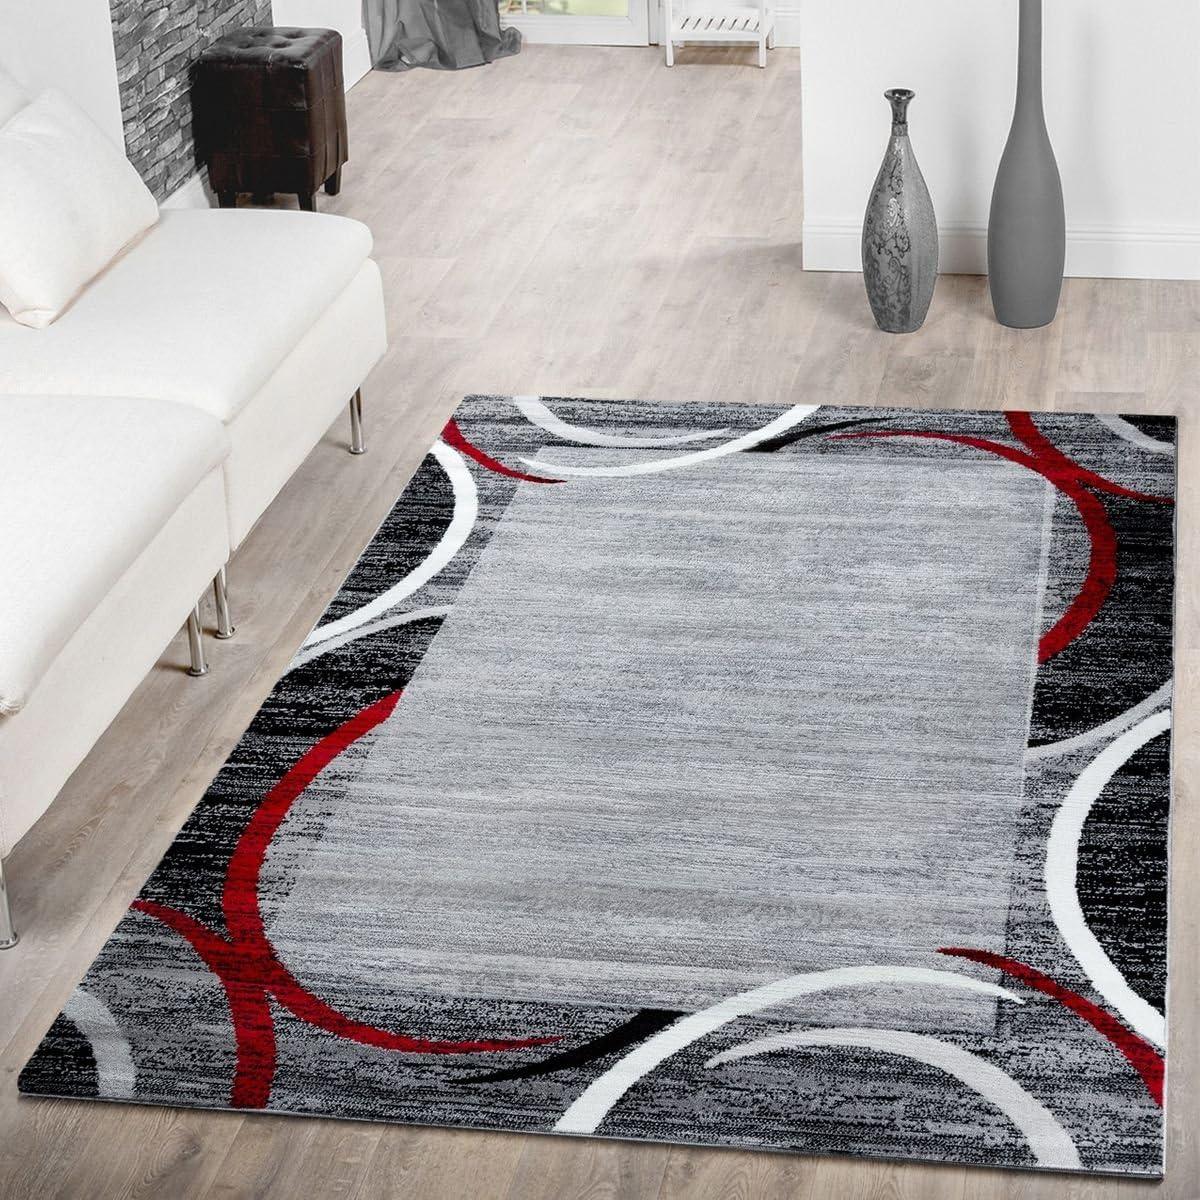 Area Rug for Living メーカー直売 限定タイムセール Room Modern Good Border Value Mot Semicircle